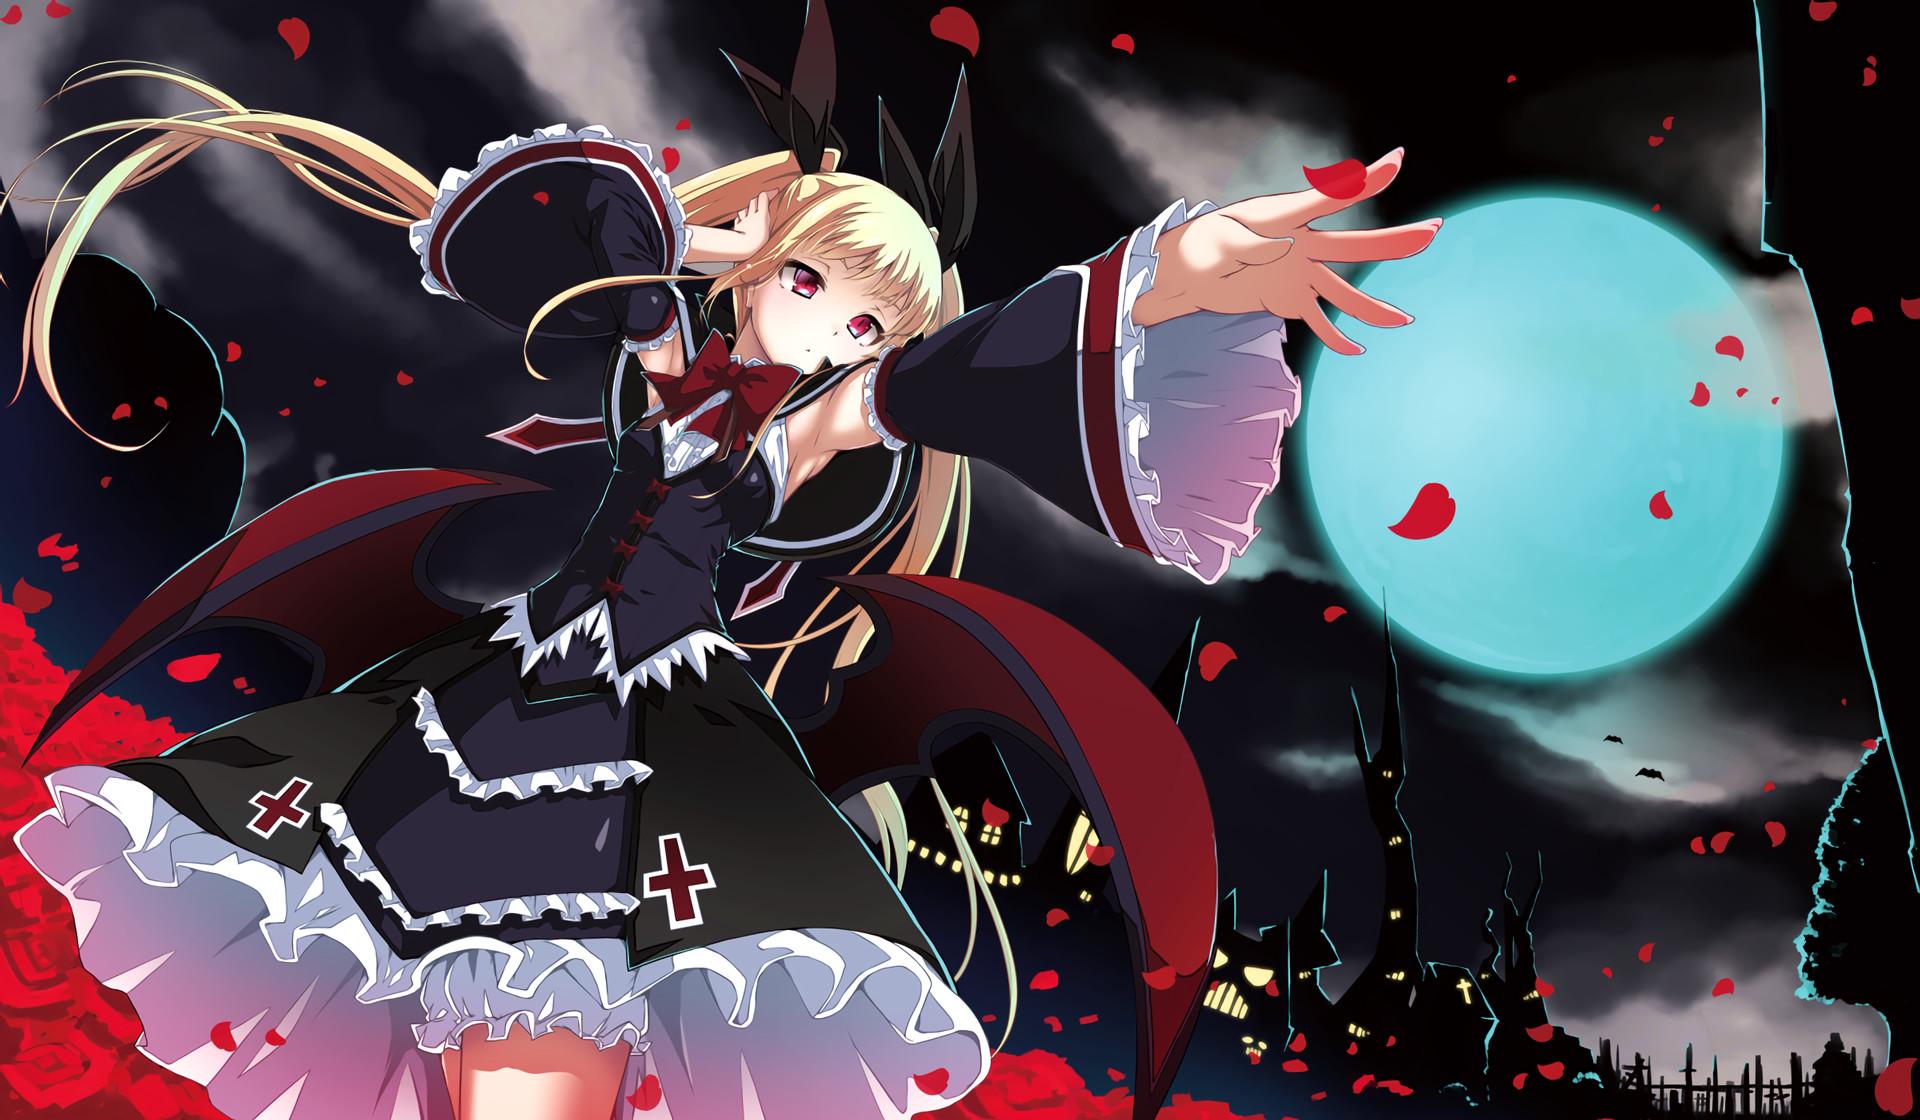 Anime – Blazblue Rachel Alucard Wallpaper